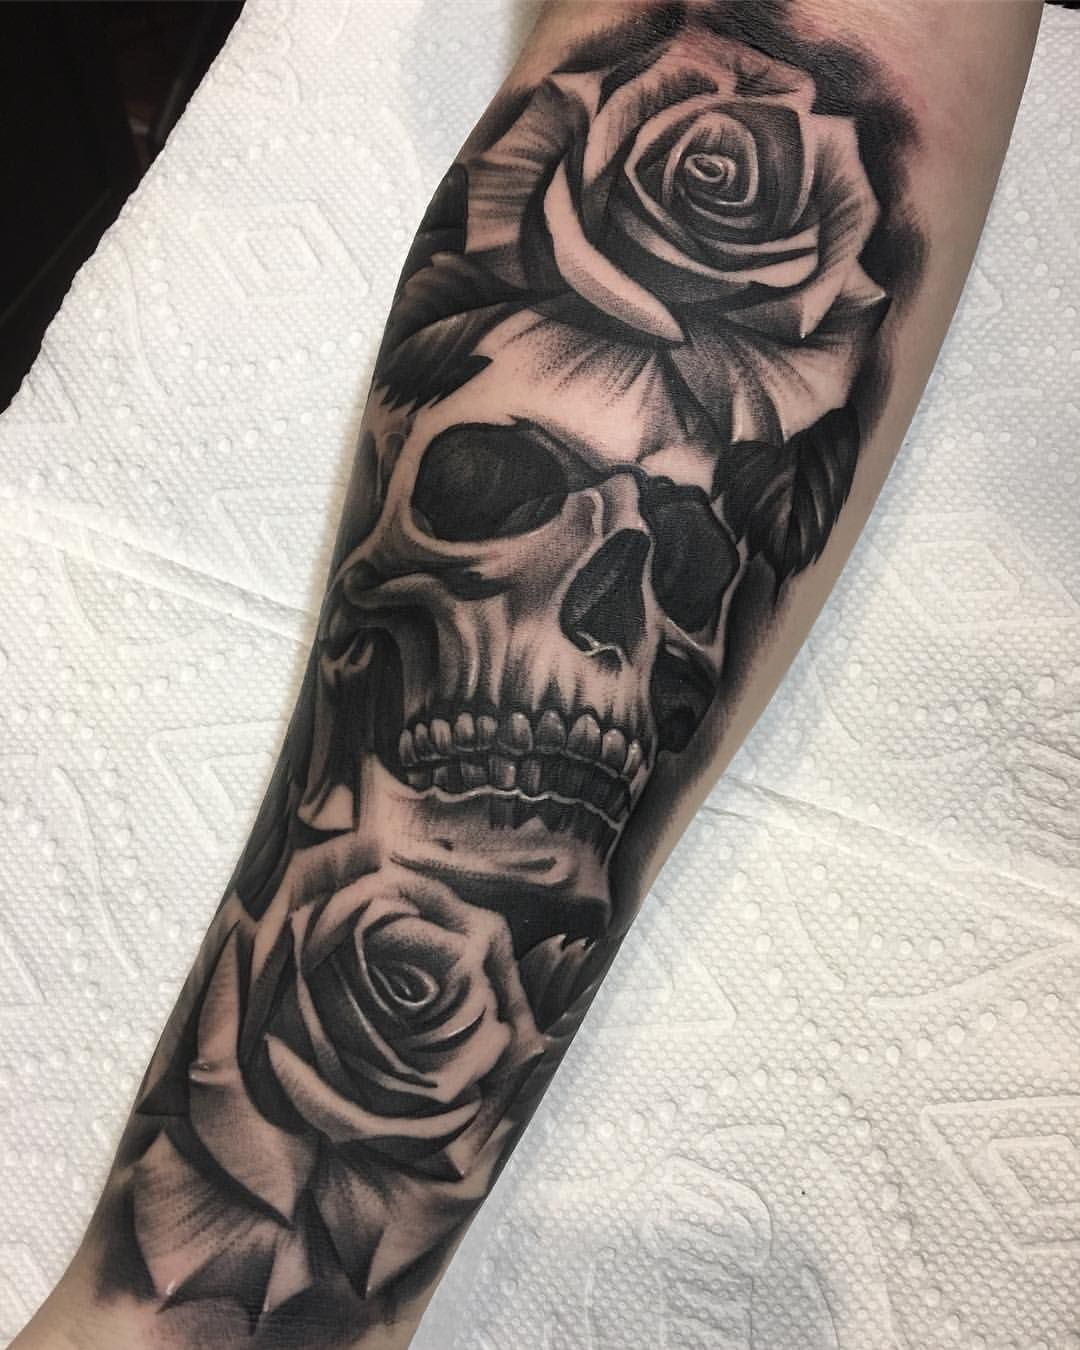 Skulls And Roses Are Always Funnnnn Undertheguntattoo Tattoo Art Hollywood Losangeles Califo Skull Sleeve Tattoos Hand Tattoos For Guys Rose Tattoos